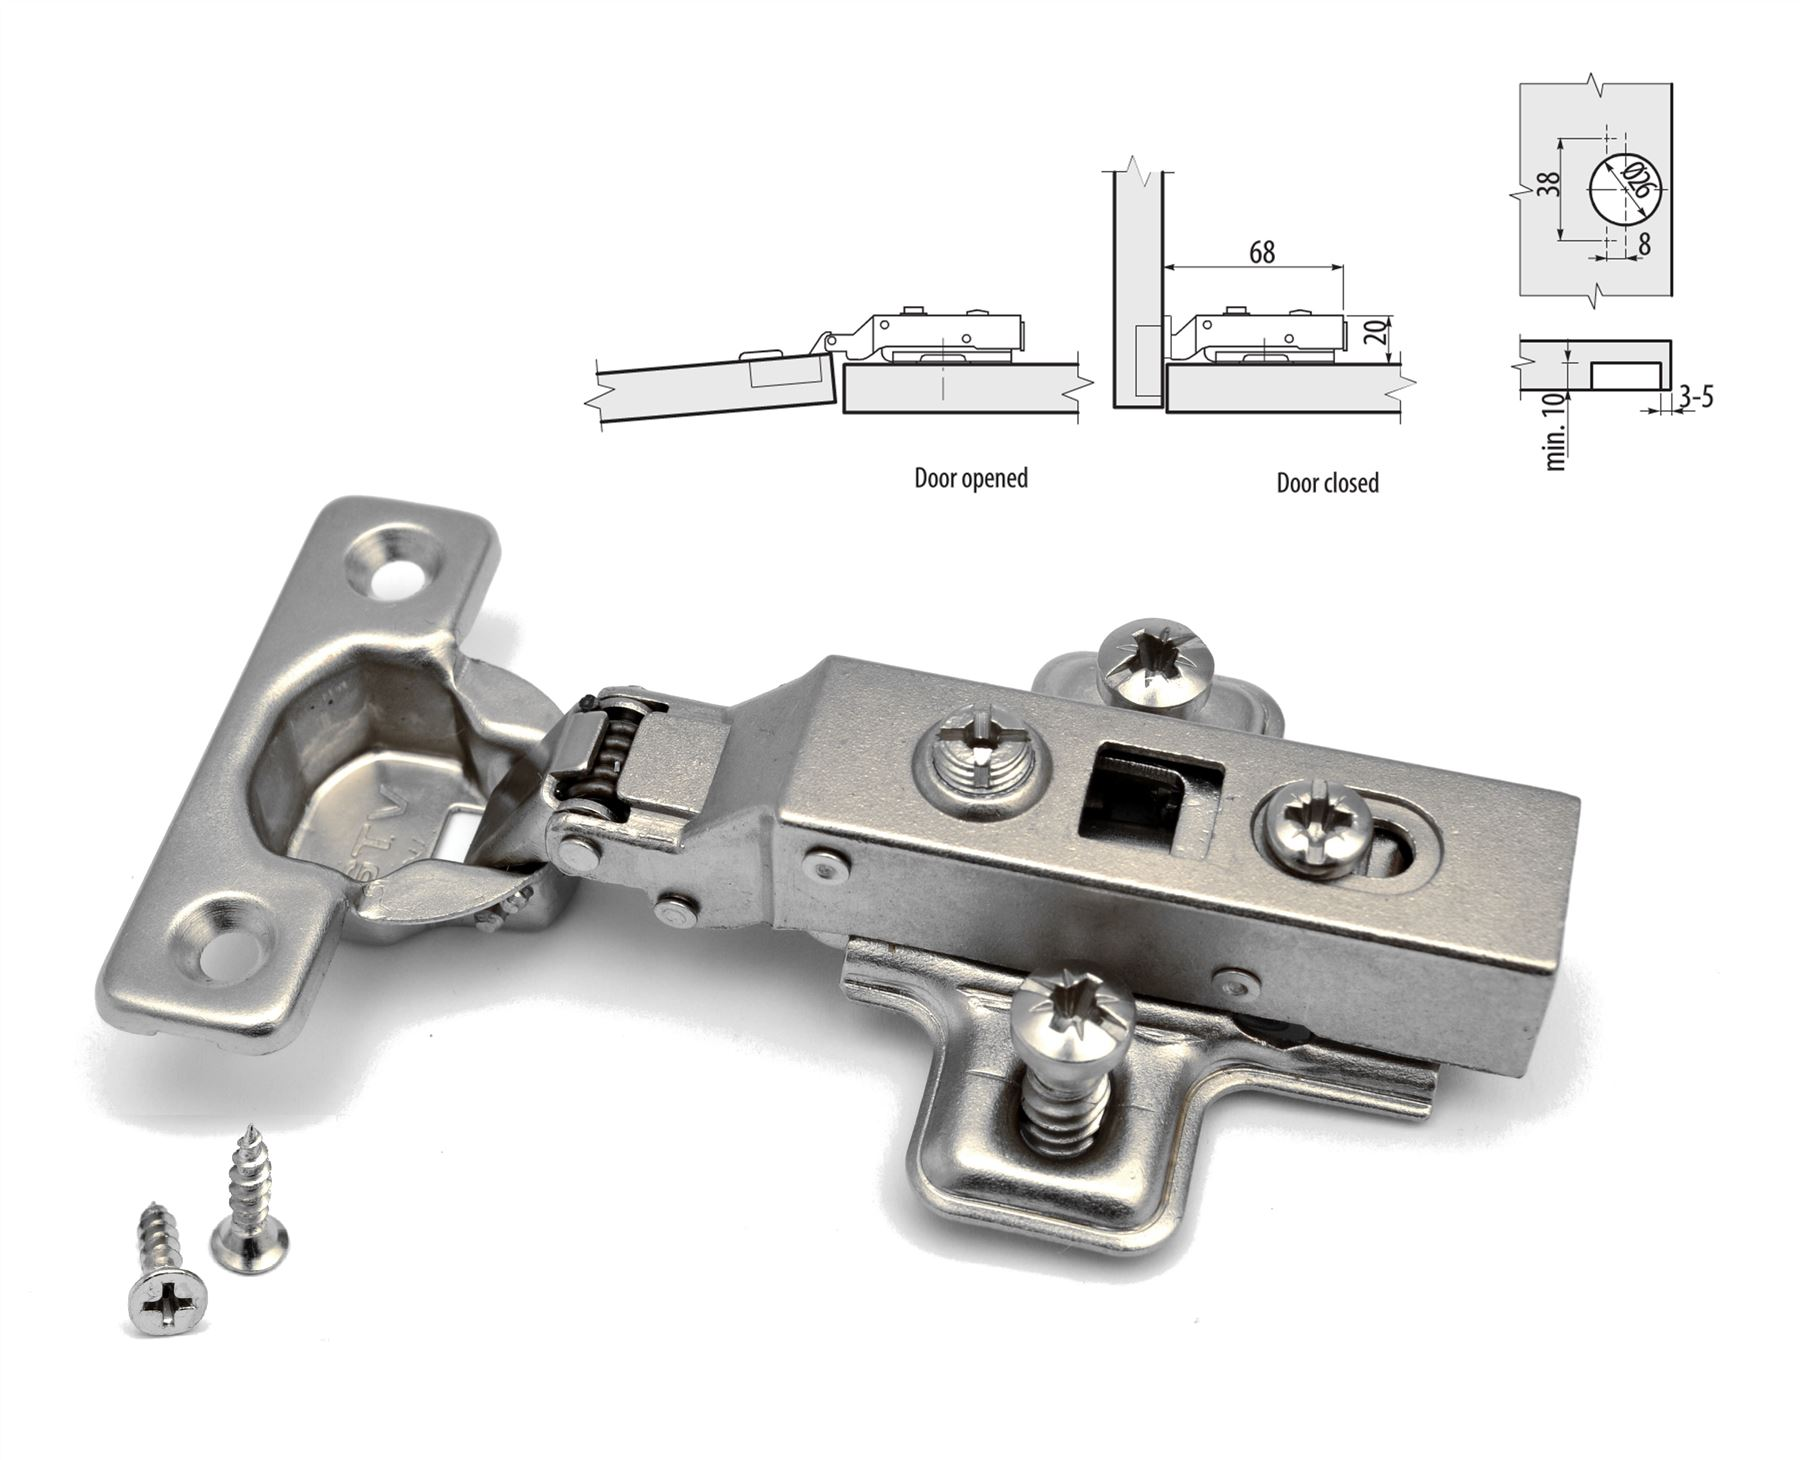 GTV SOFT CLOSE WARDROBE KITCHEN CABINET MINI DOOR HINGE 26mm PLATE ...